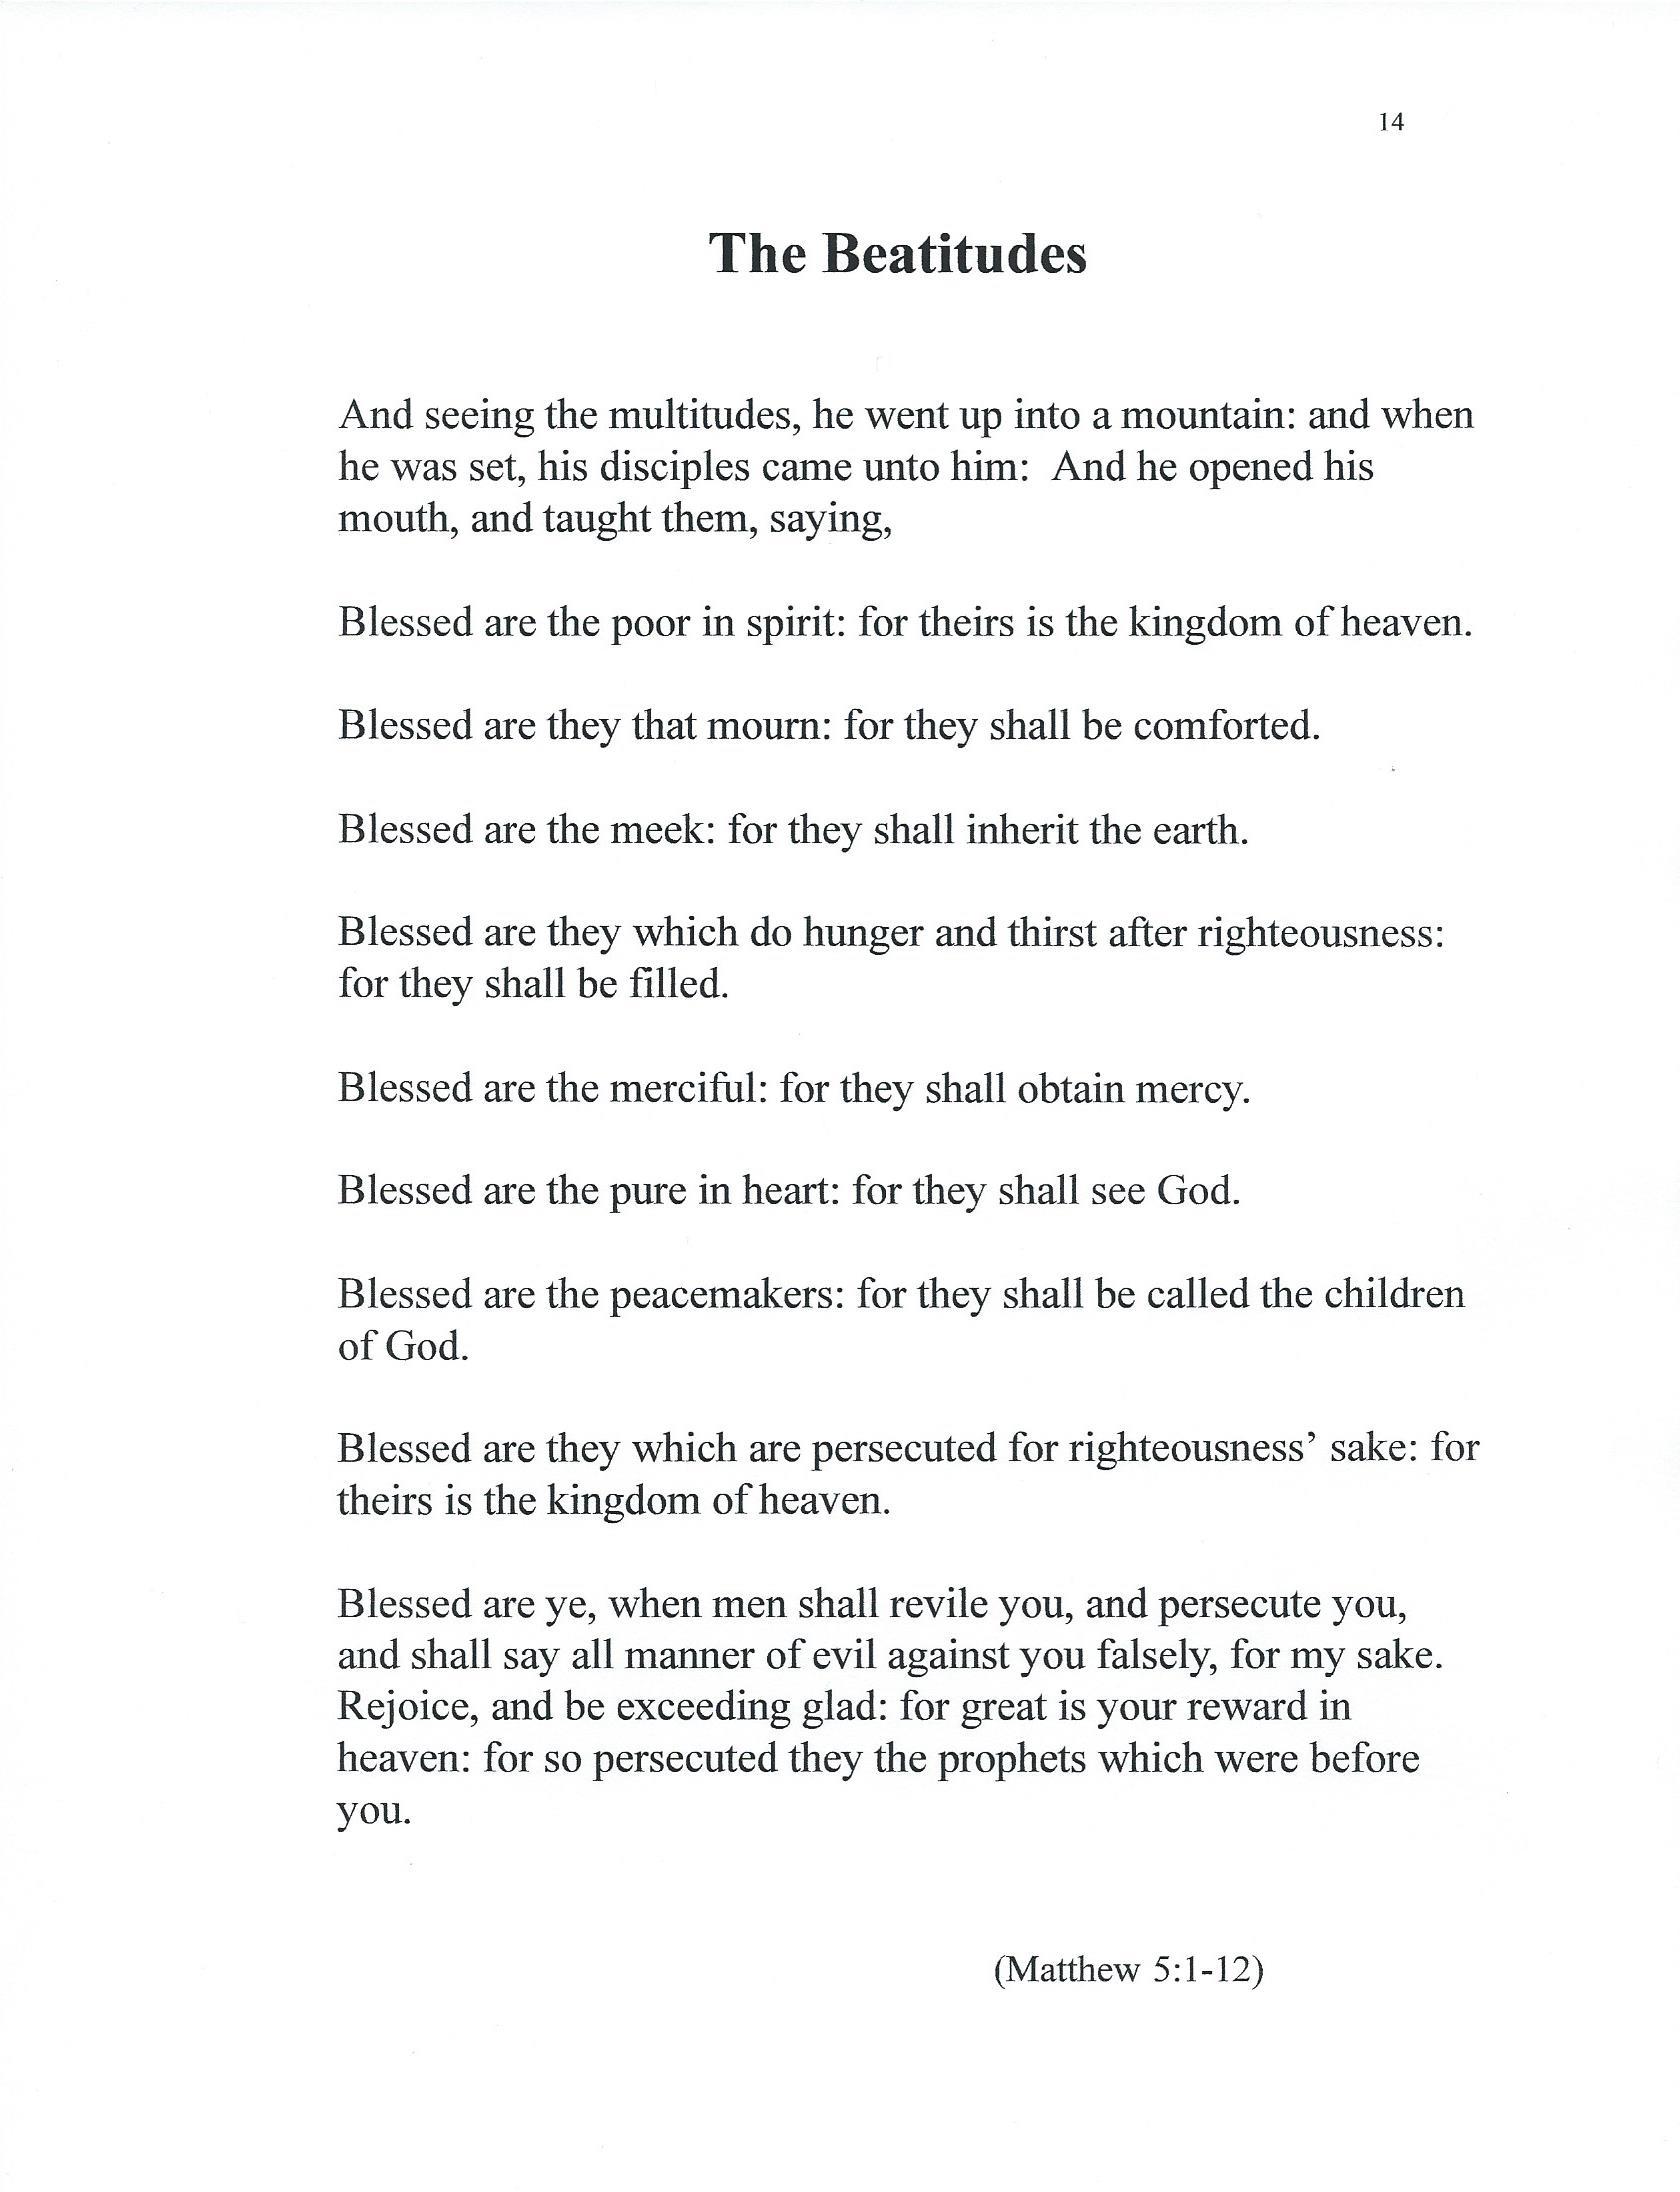 The Words Of The Beatitudes Matthew 5 1 12